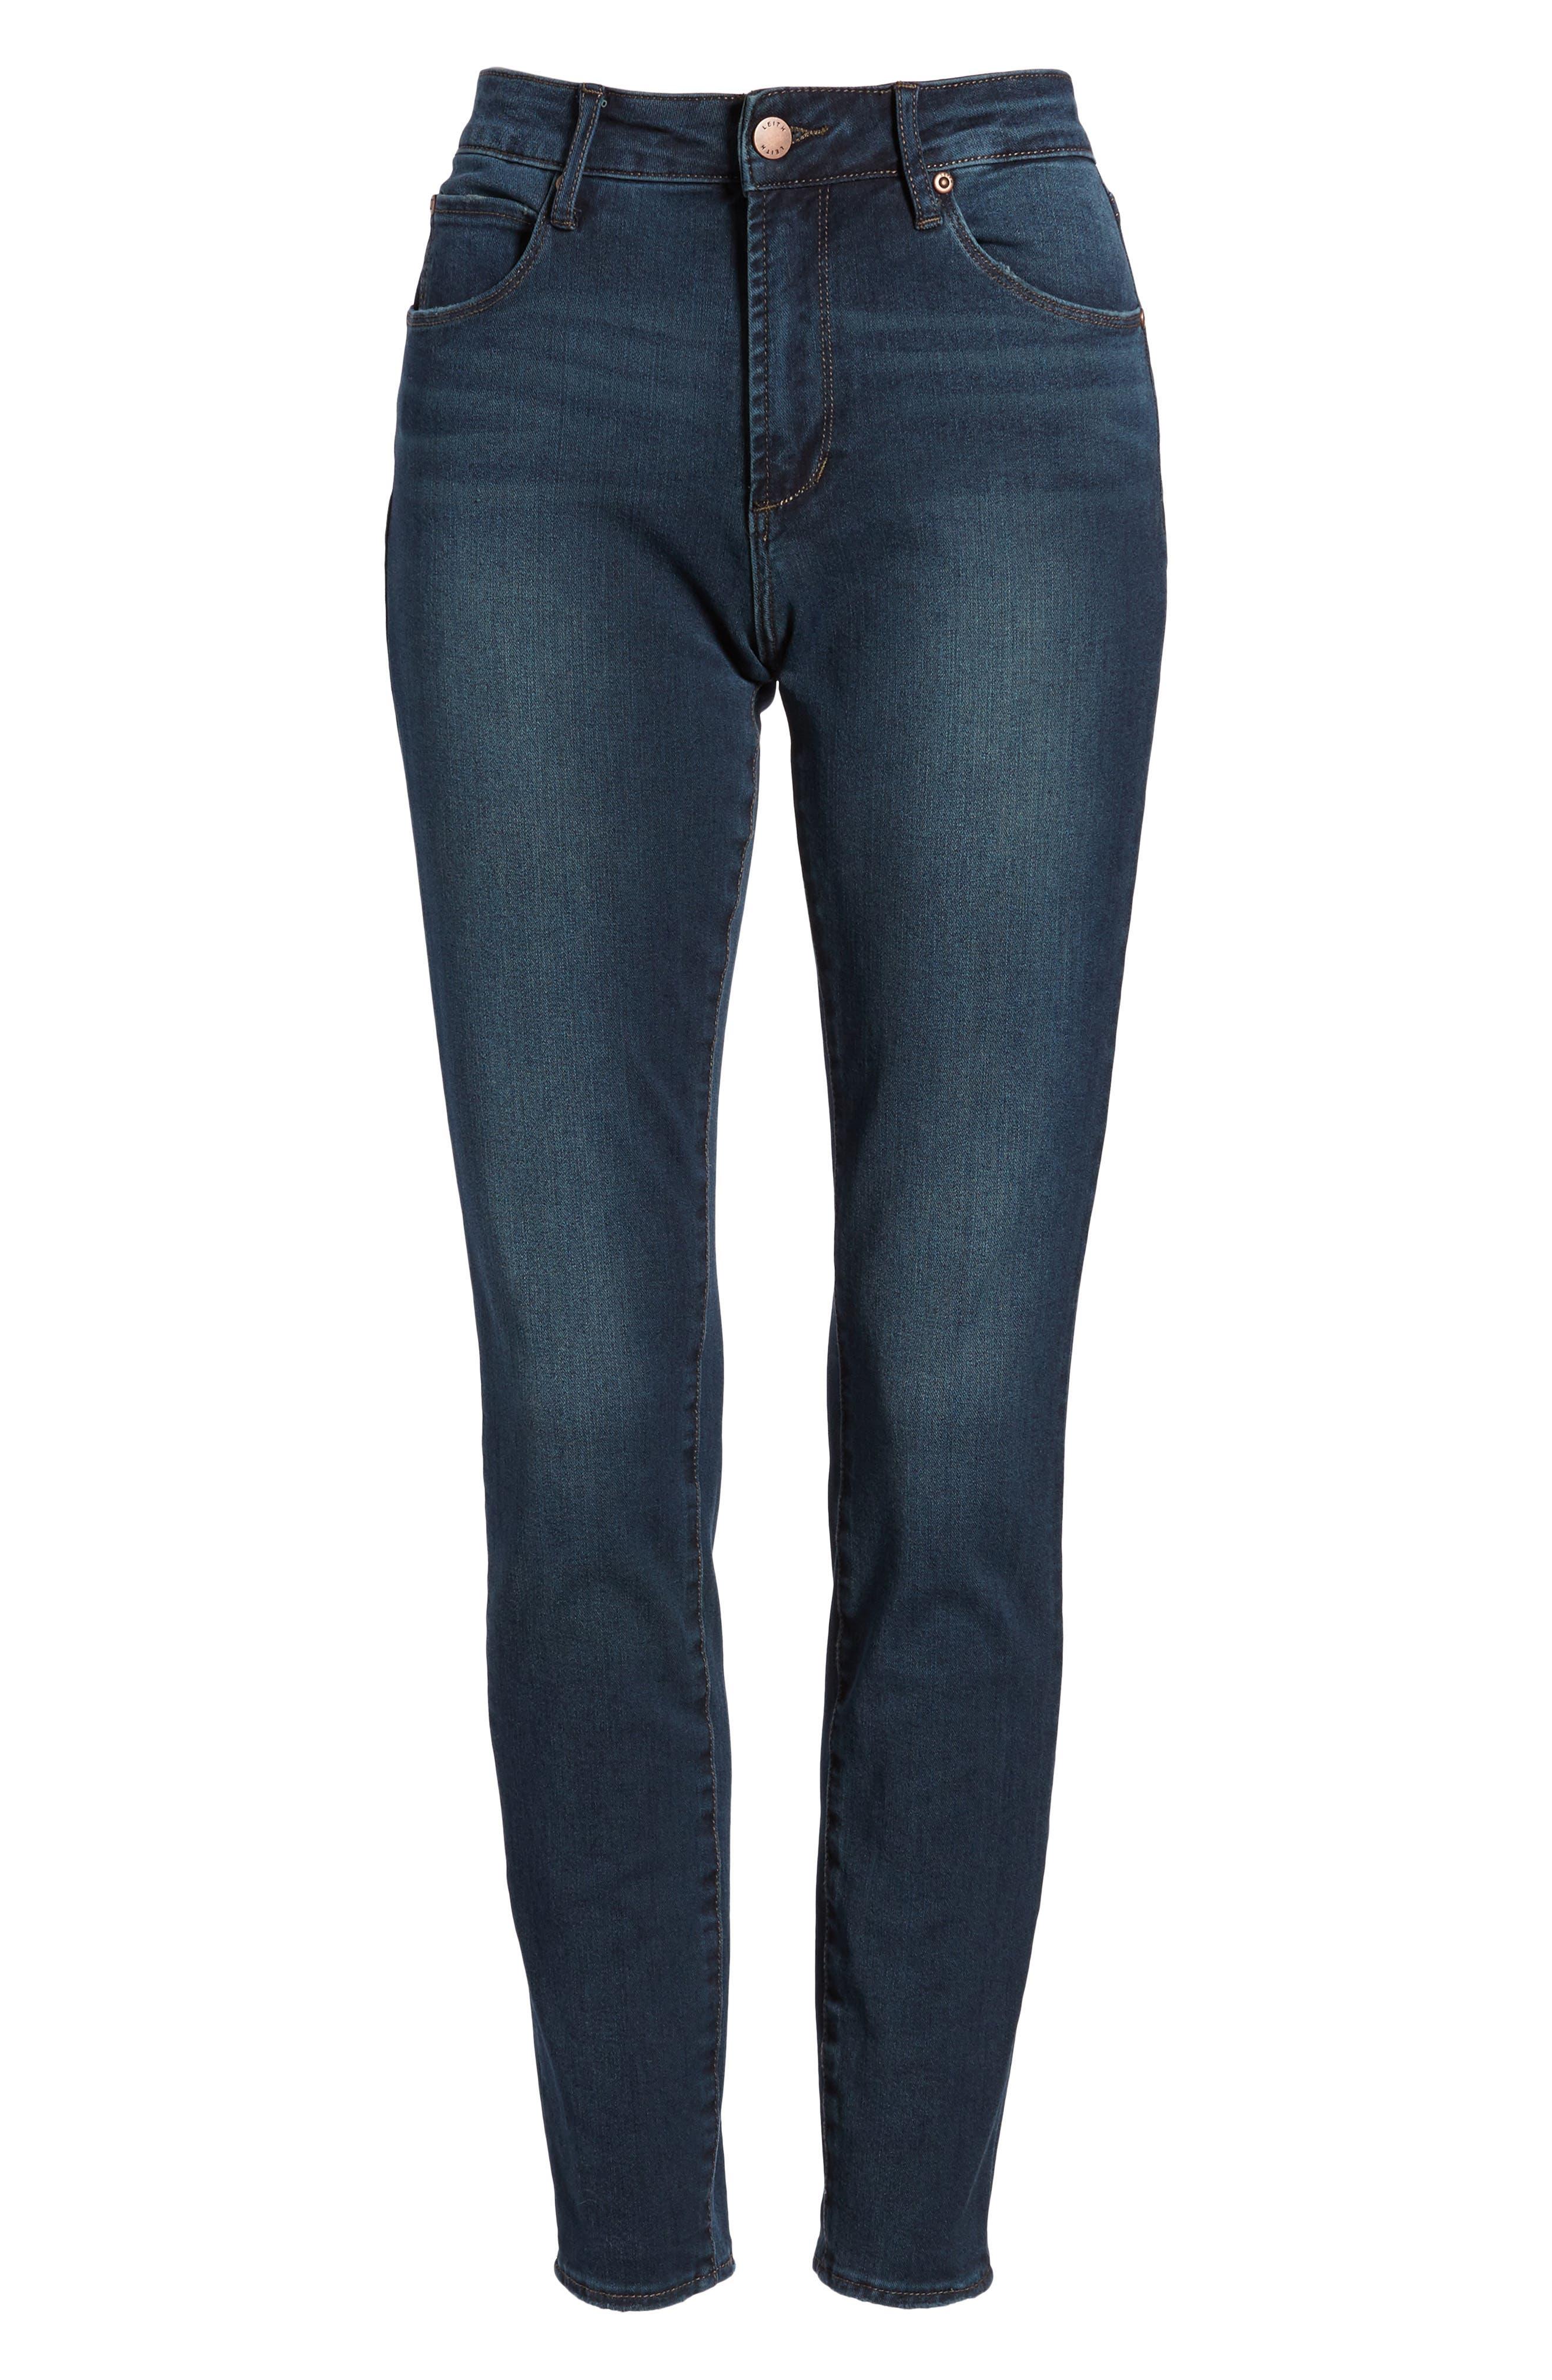 Skinny Jeans,                             Alternate thumbnail 7, color,                             420